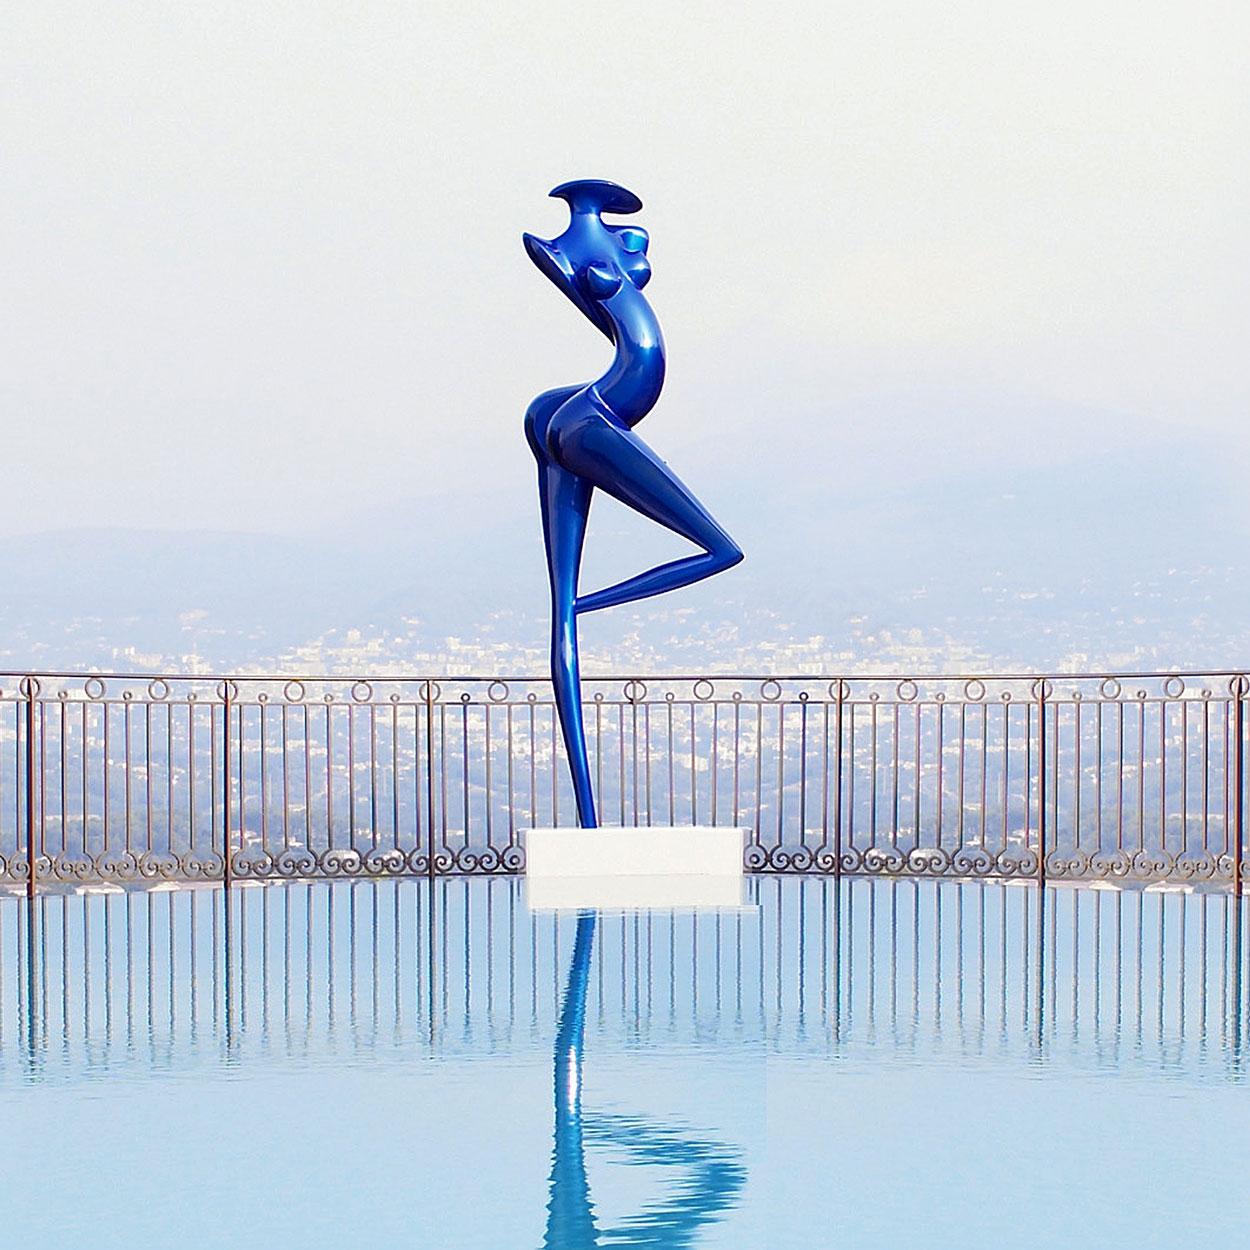 Danseuse, 3 metres Monumental sculpture in carbon